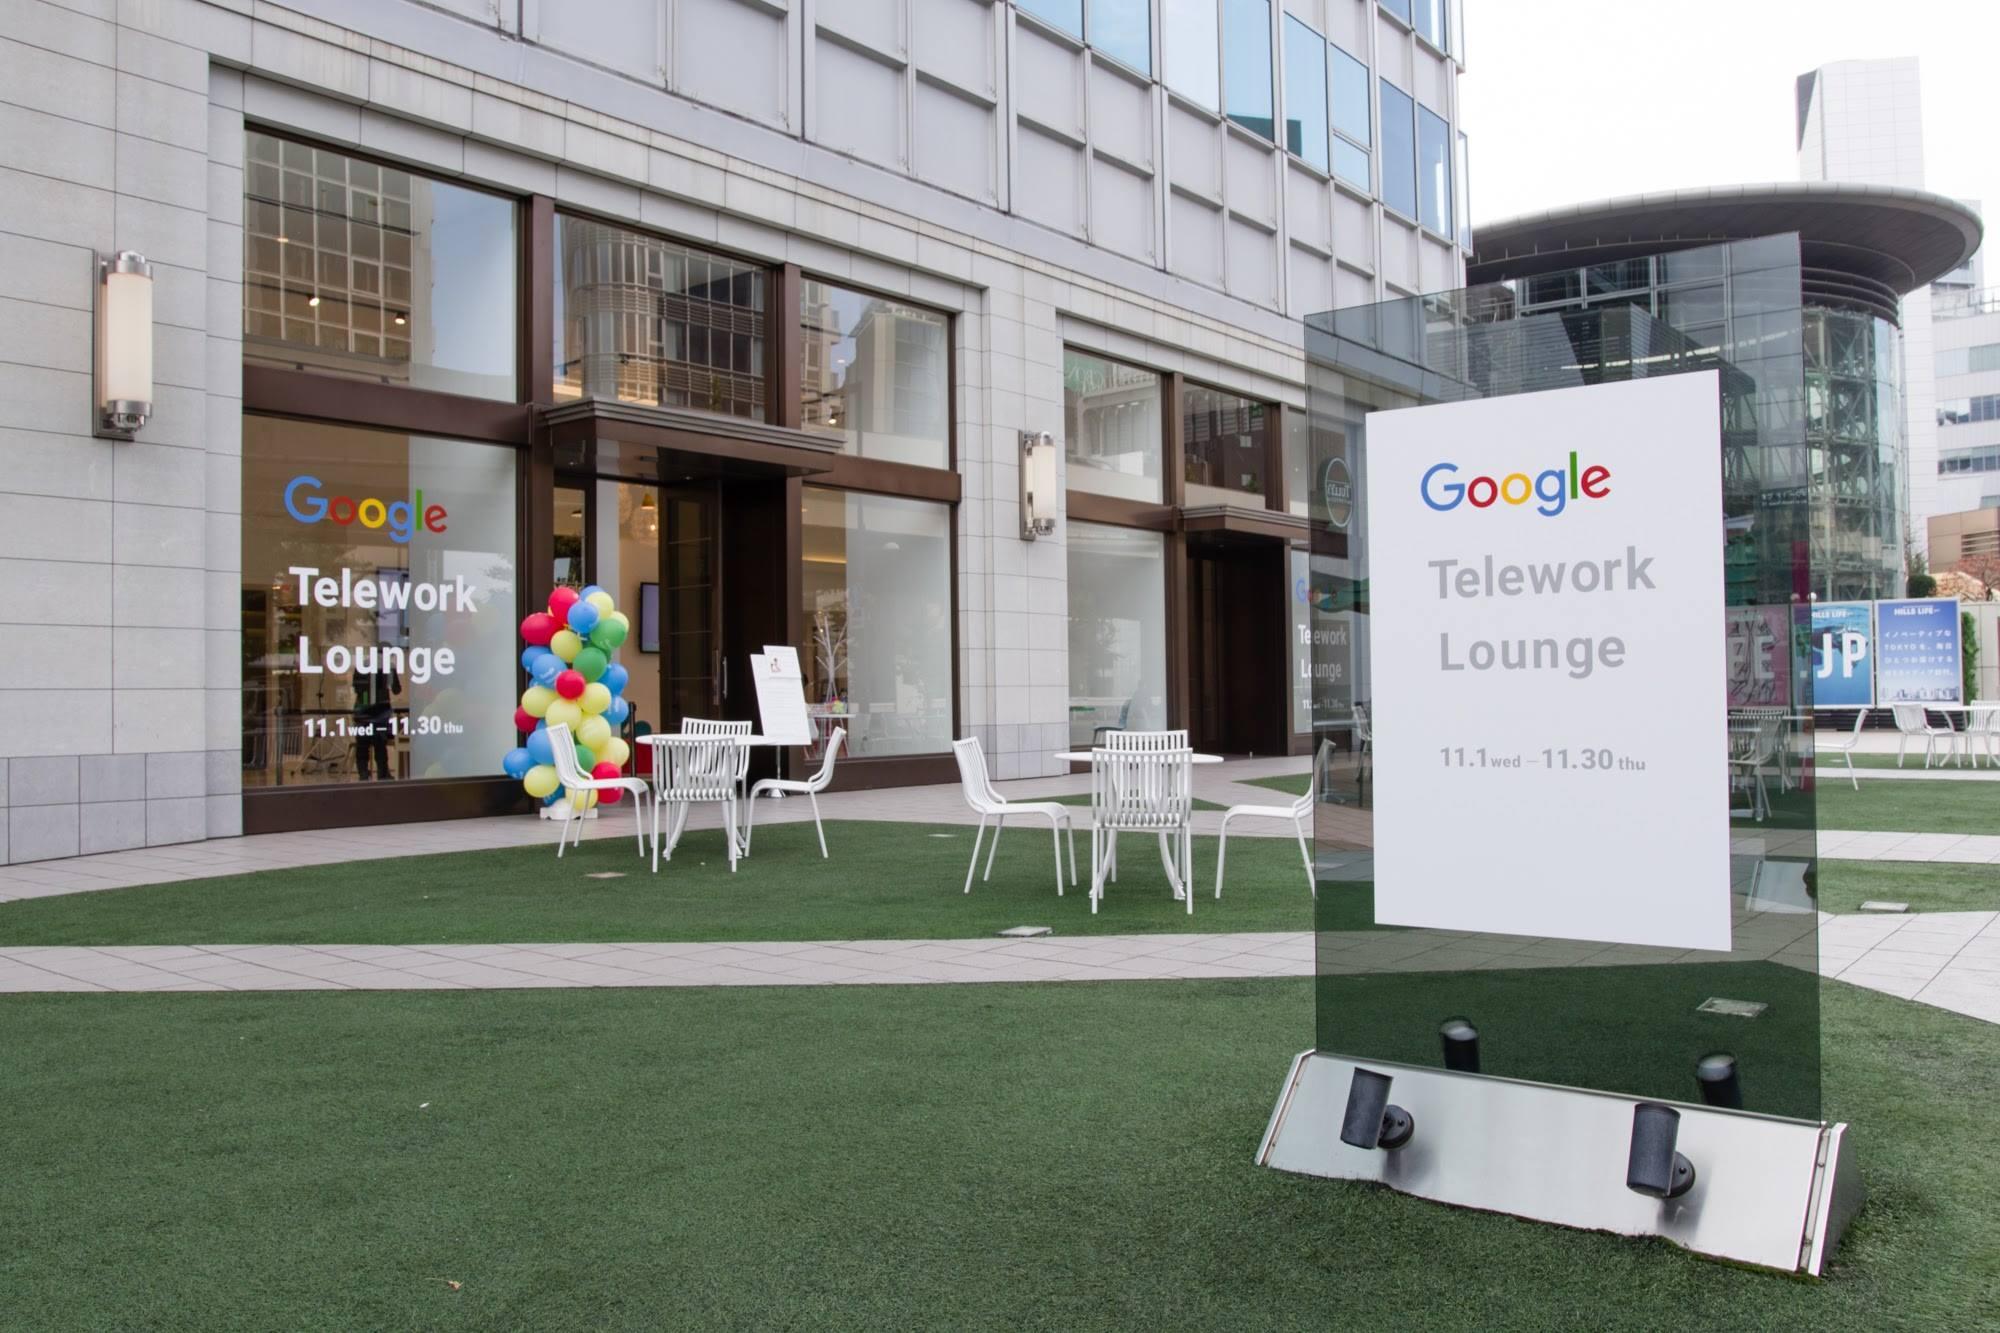 Google Telework Lounge 六本木 セミナー出演